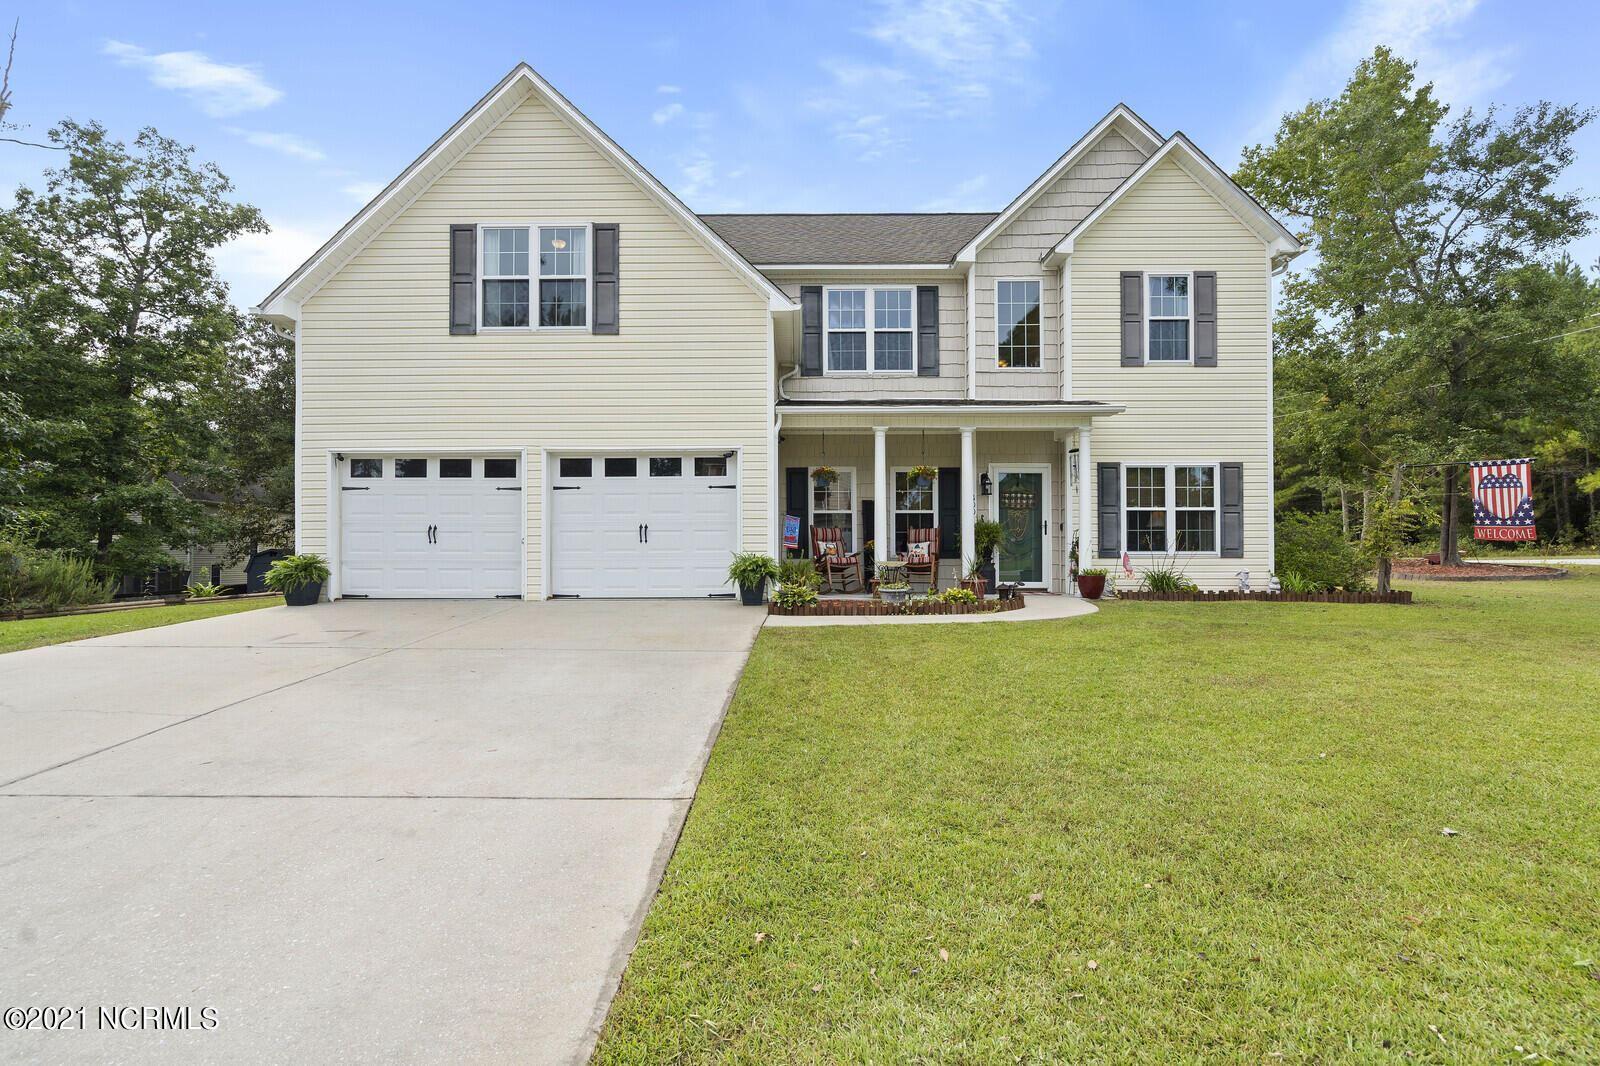 Photo of 100 Carl Williams Road, Jacksonville, NC 28540 (MLS # 100291677)